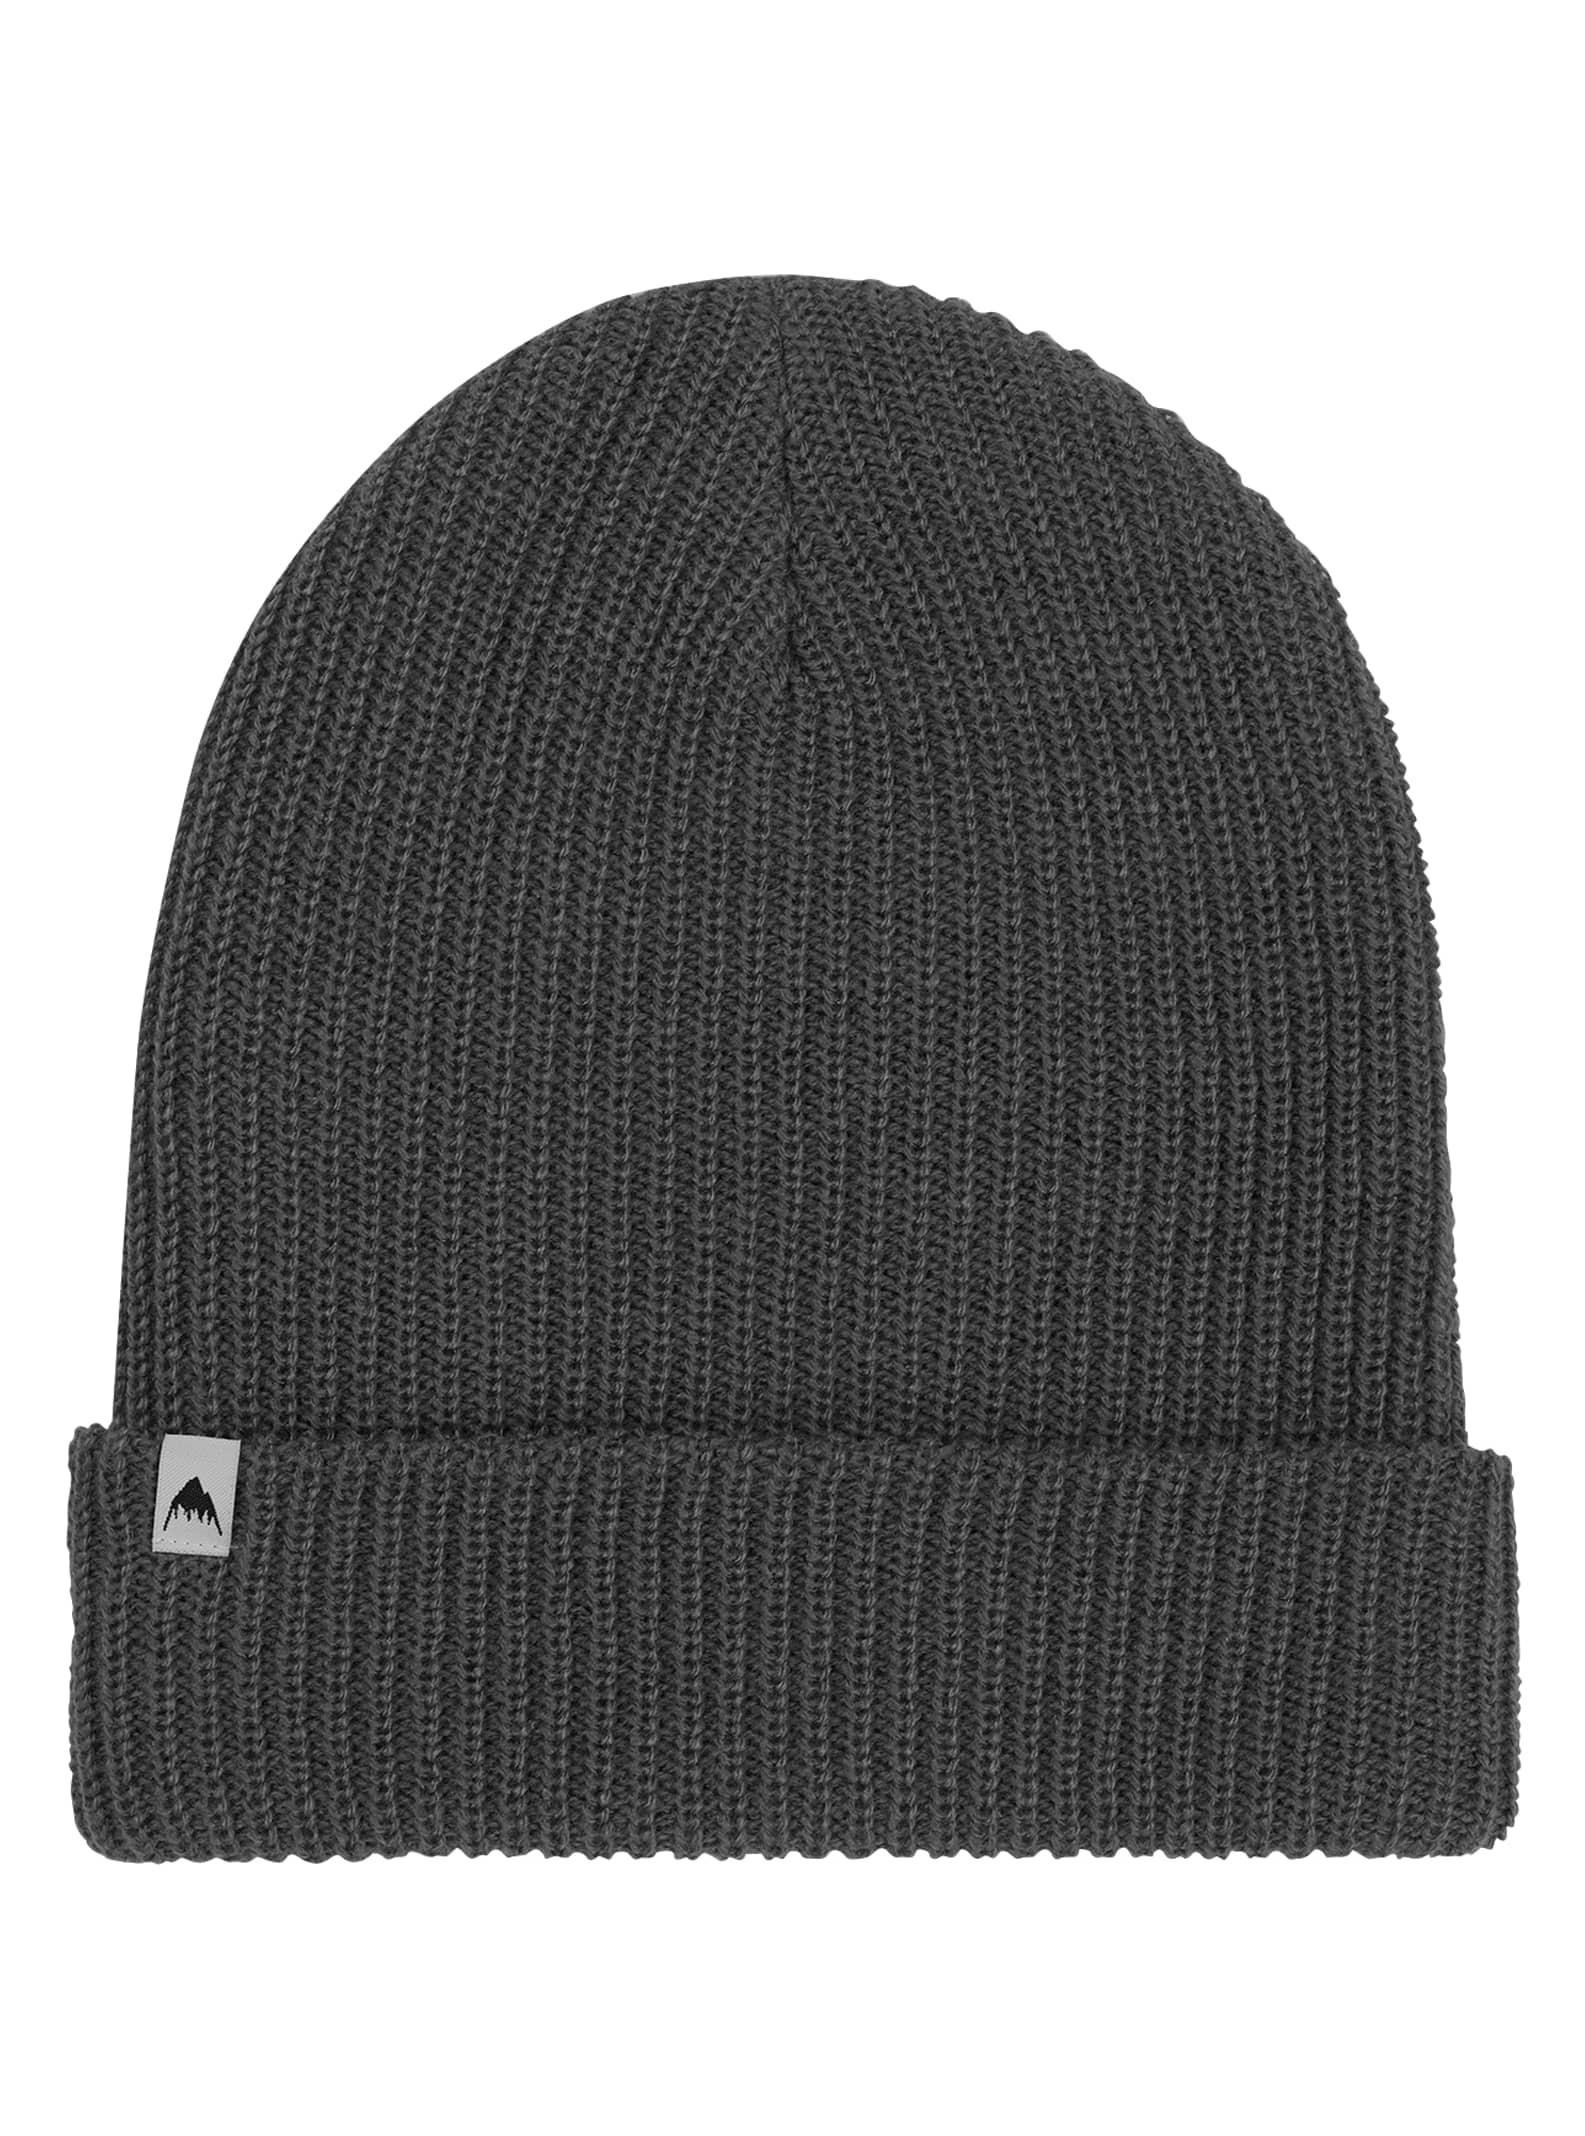 7cdbfd69d Men's Hats & Beanies | Burton Snowboards